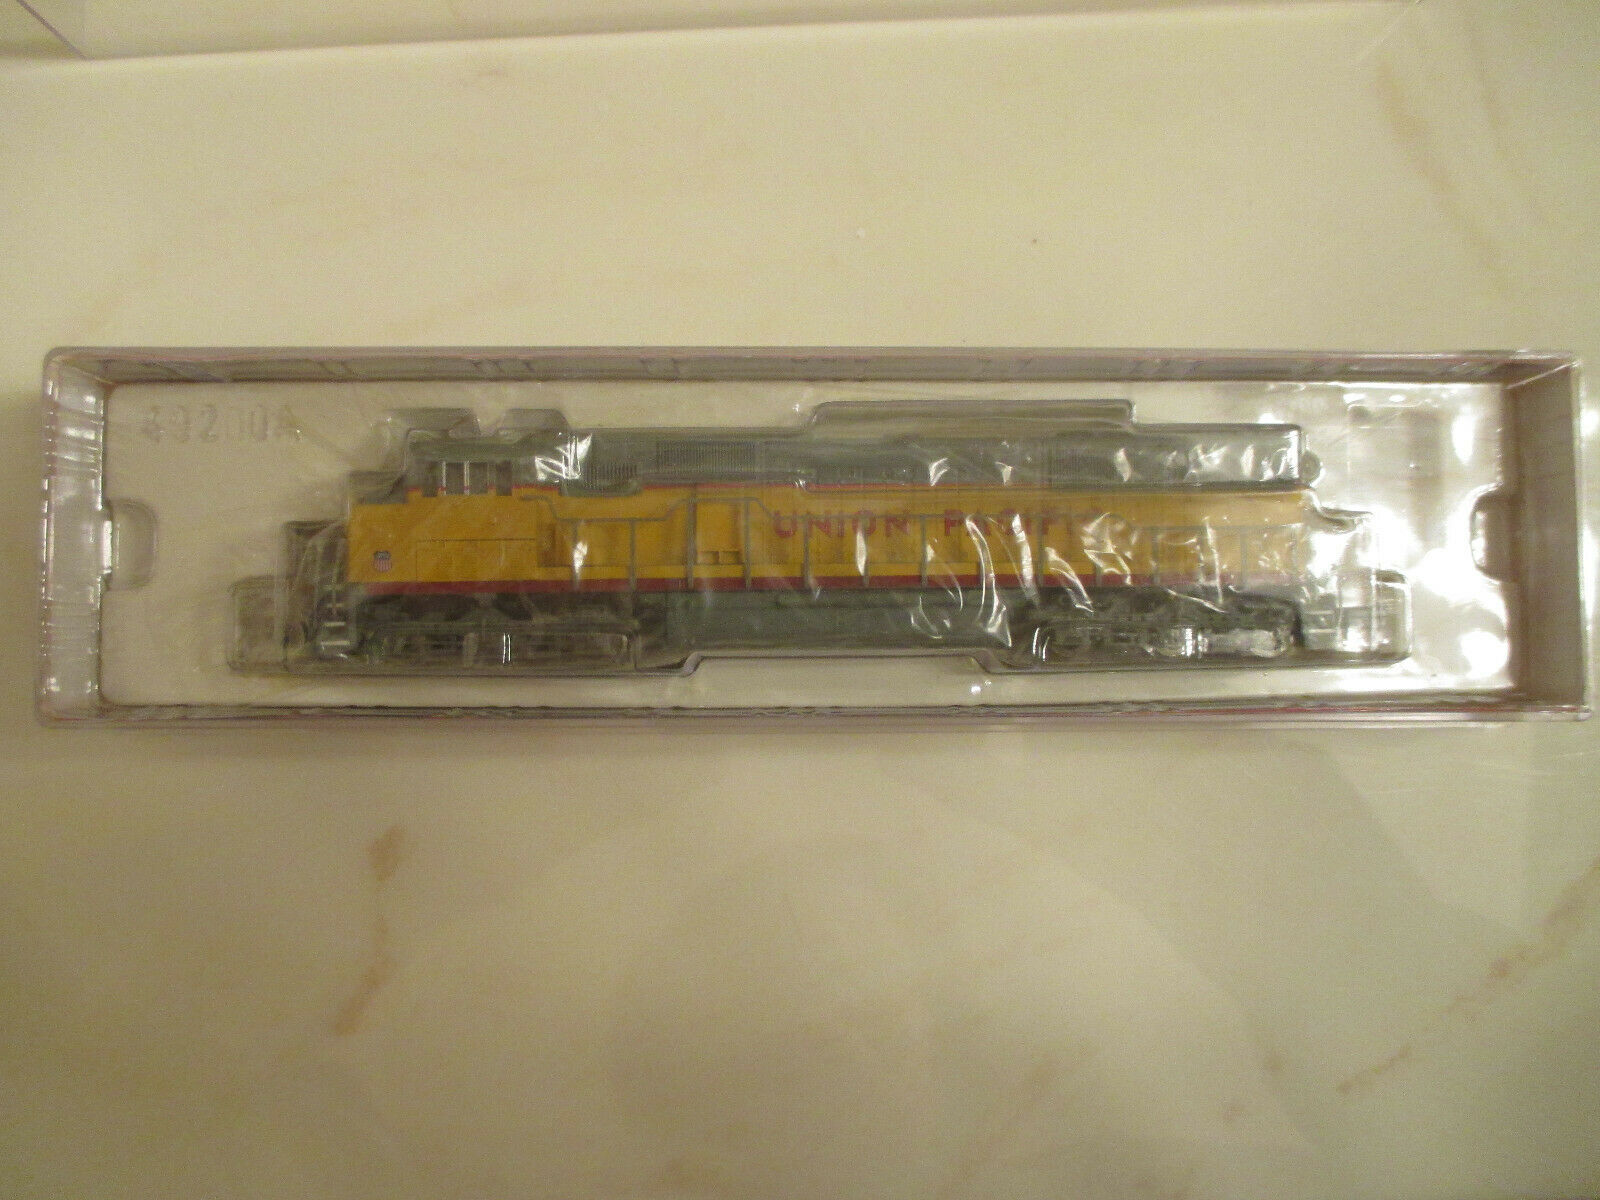 Atlas N Escala Modelo tren de Union Pacific